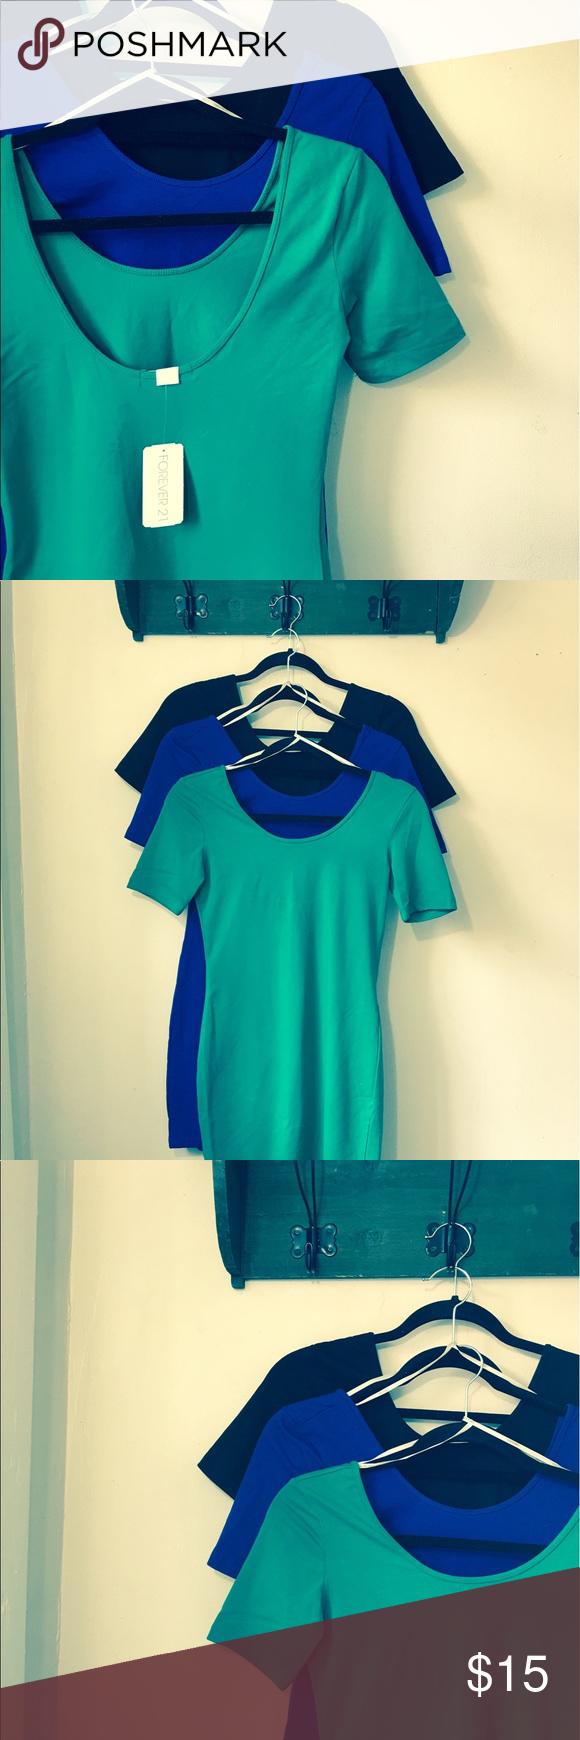 Forever 21 Mini Dresses Royal Blue, Black, & Green Spring Dresses. Make me an offer ;) Forever 21 Dresses Mini